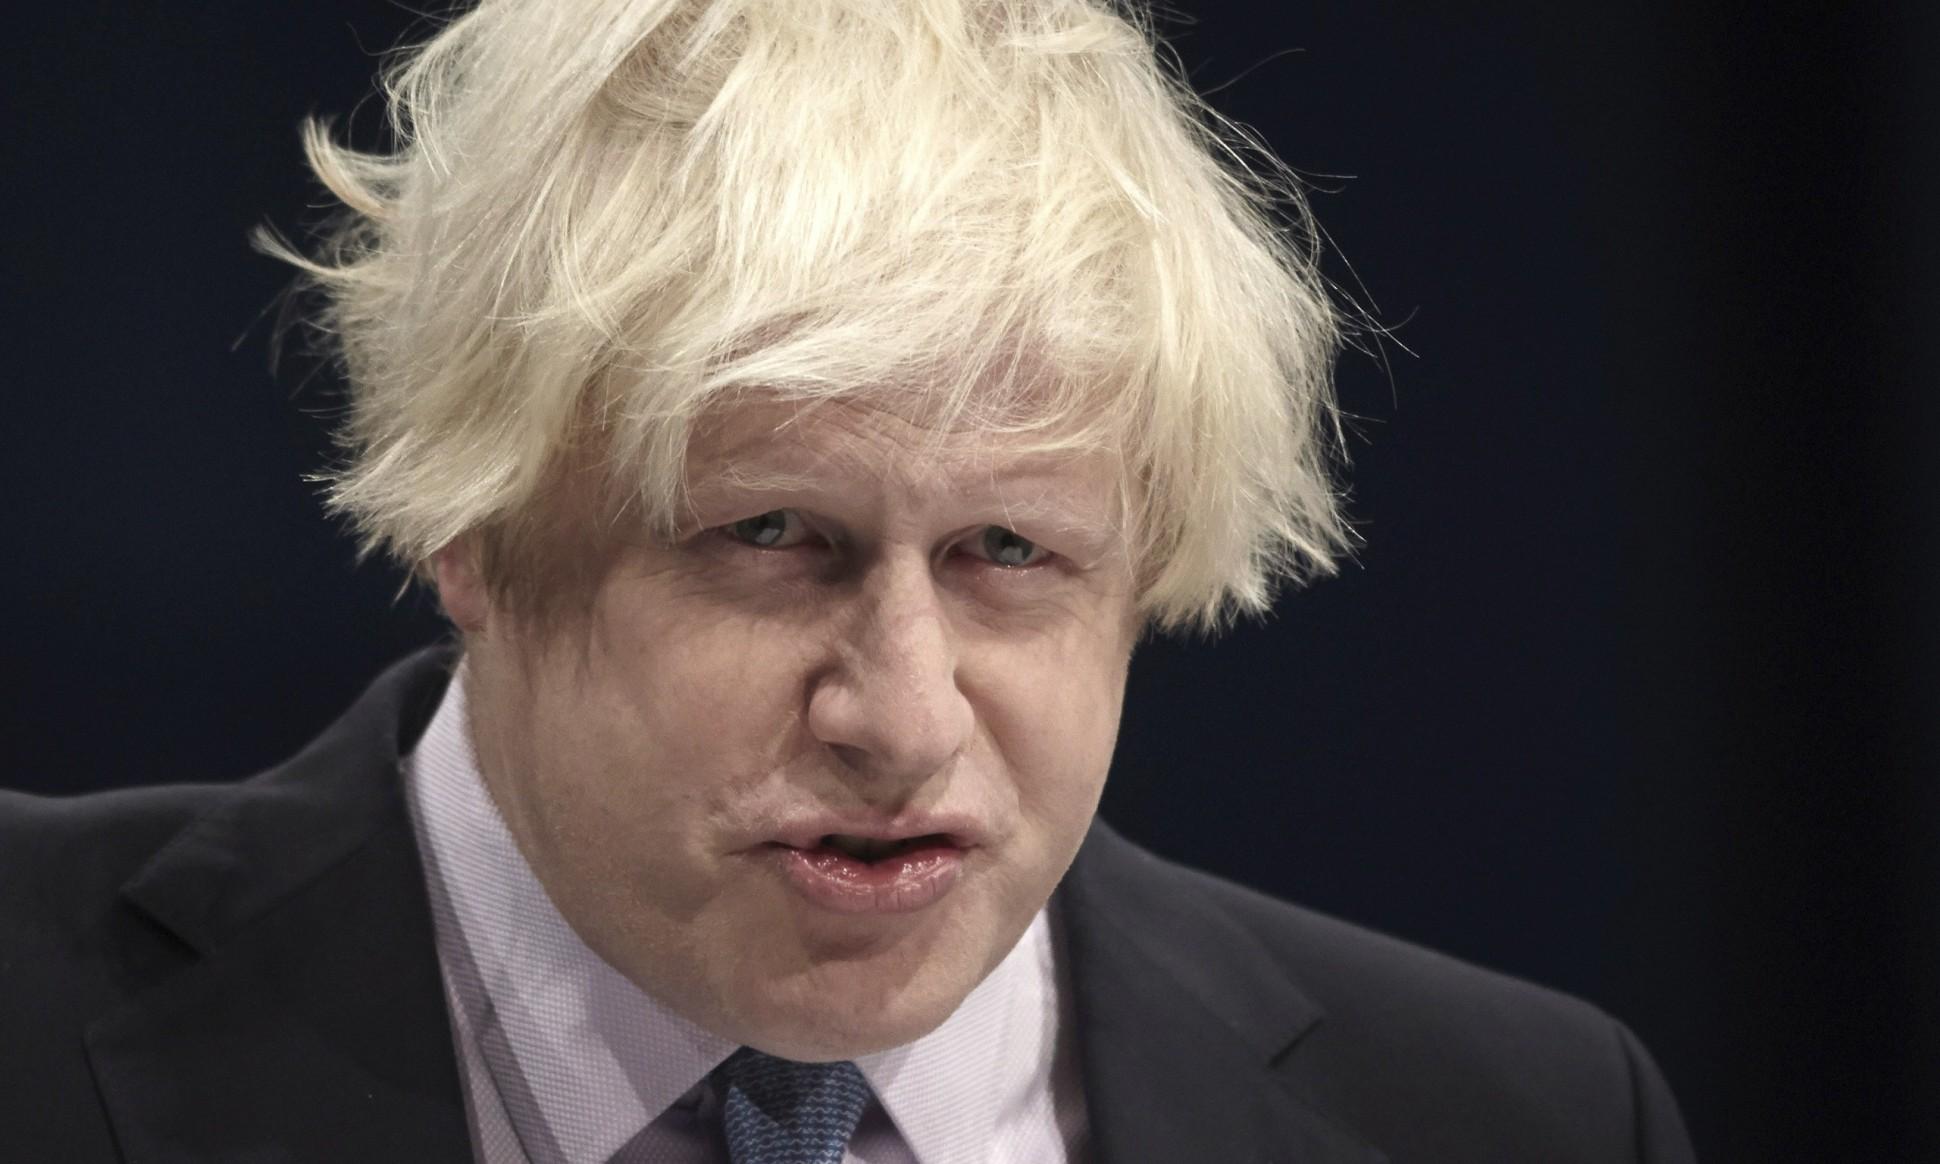 Boris-Johnson-0141-1940x1164